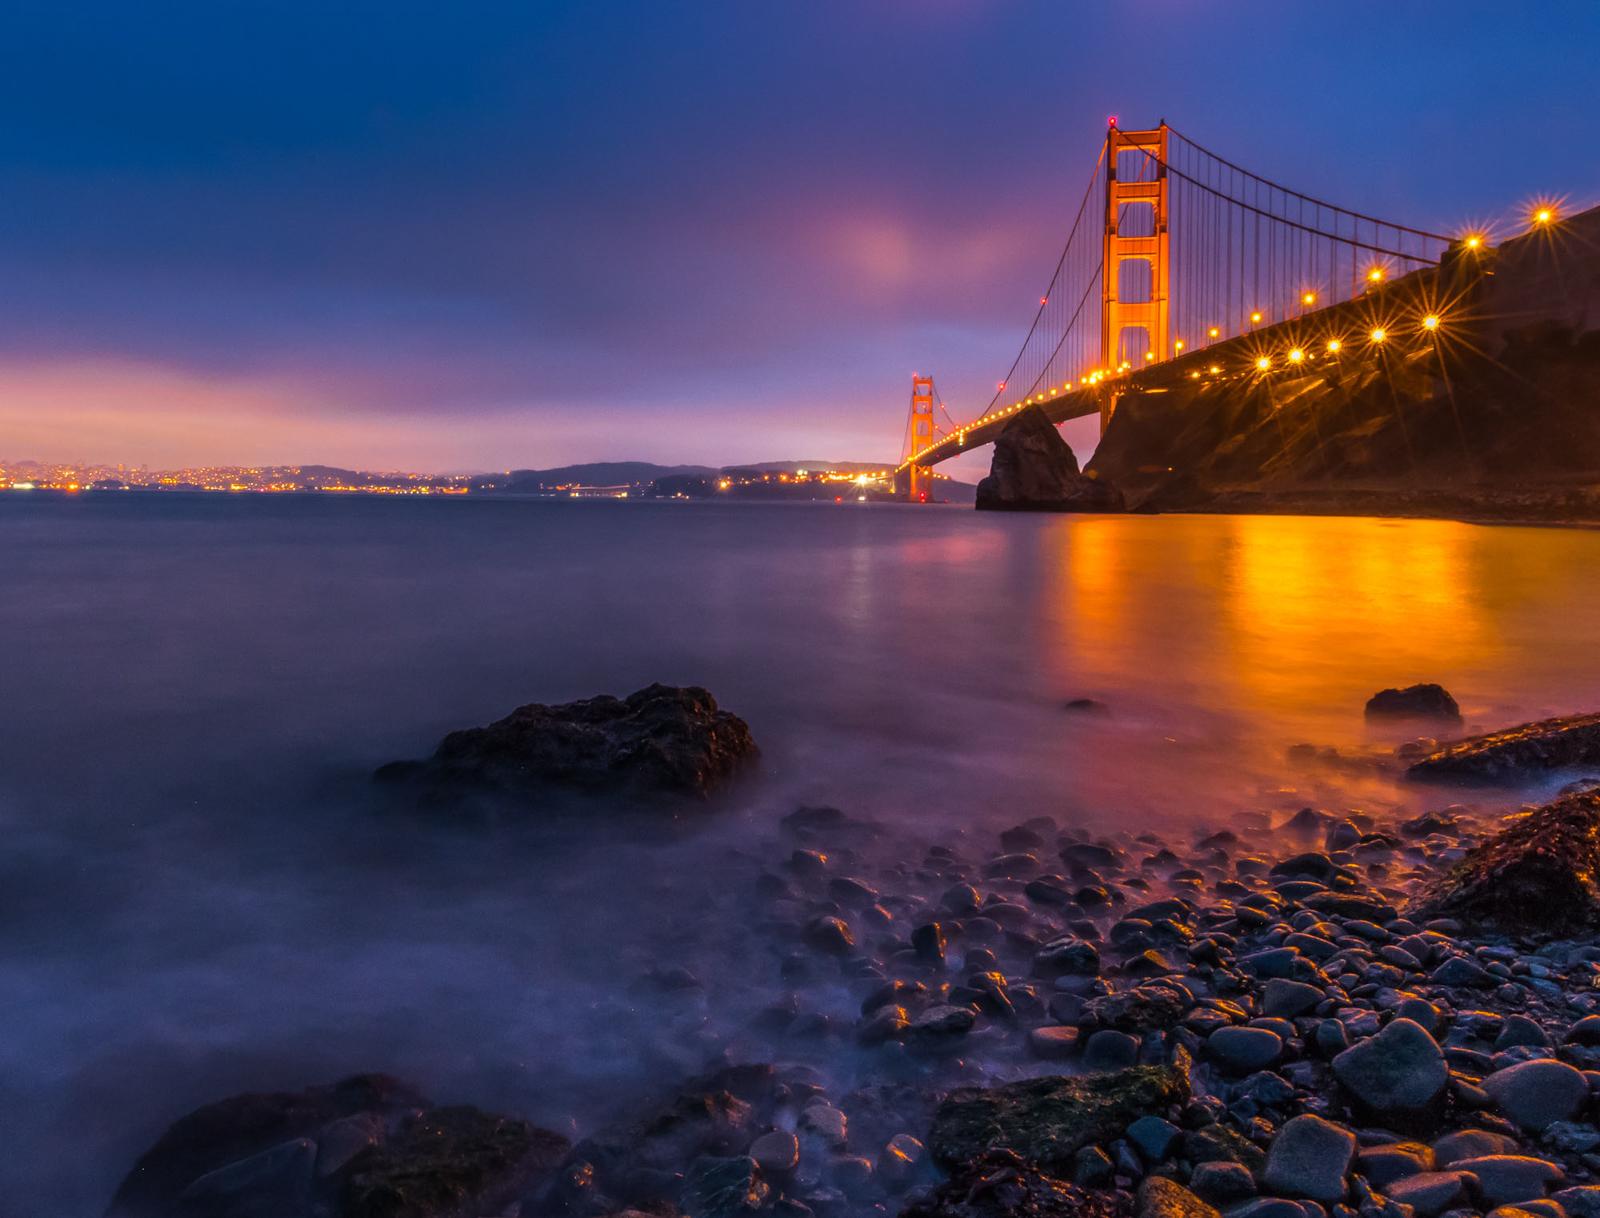 Adam Jacobs Photography Bay Area Photographs-11.jpg